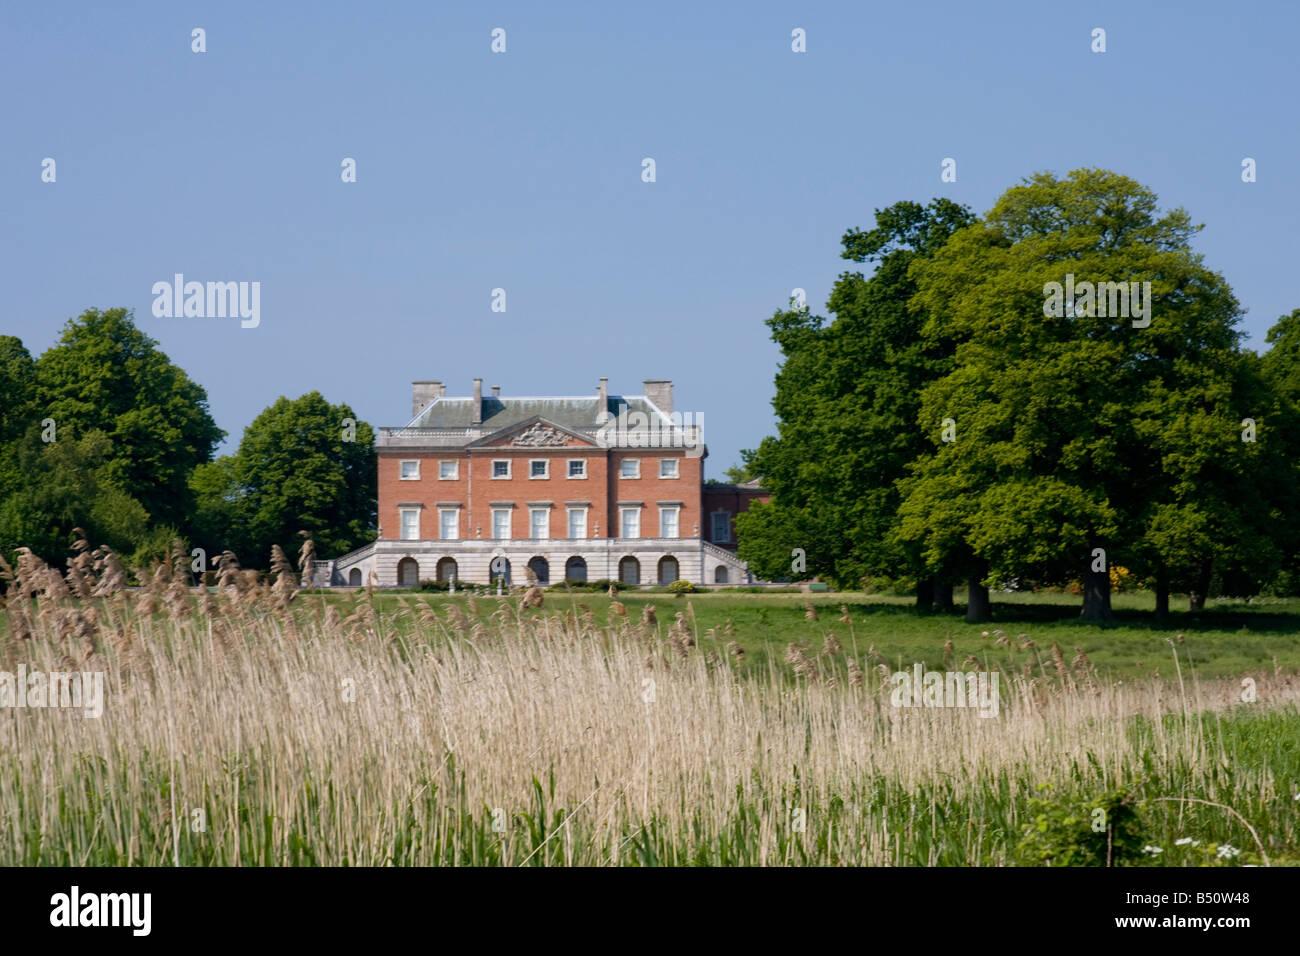 Wolterton Hall near Aylsham, Norfolk, England - Stock Image